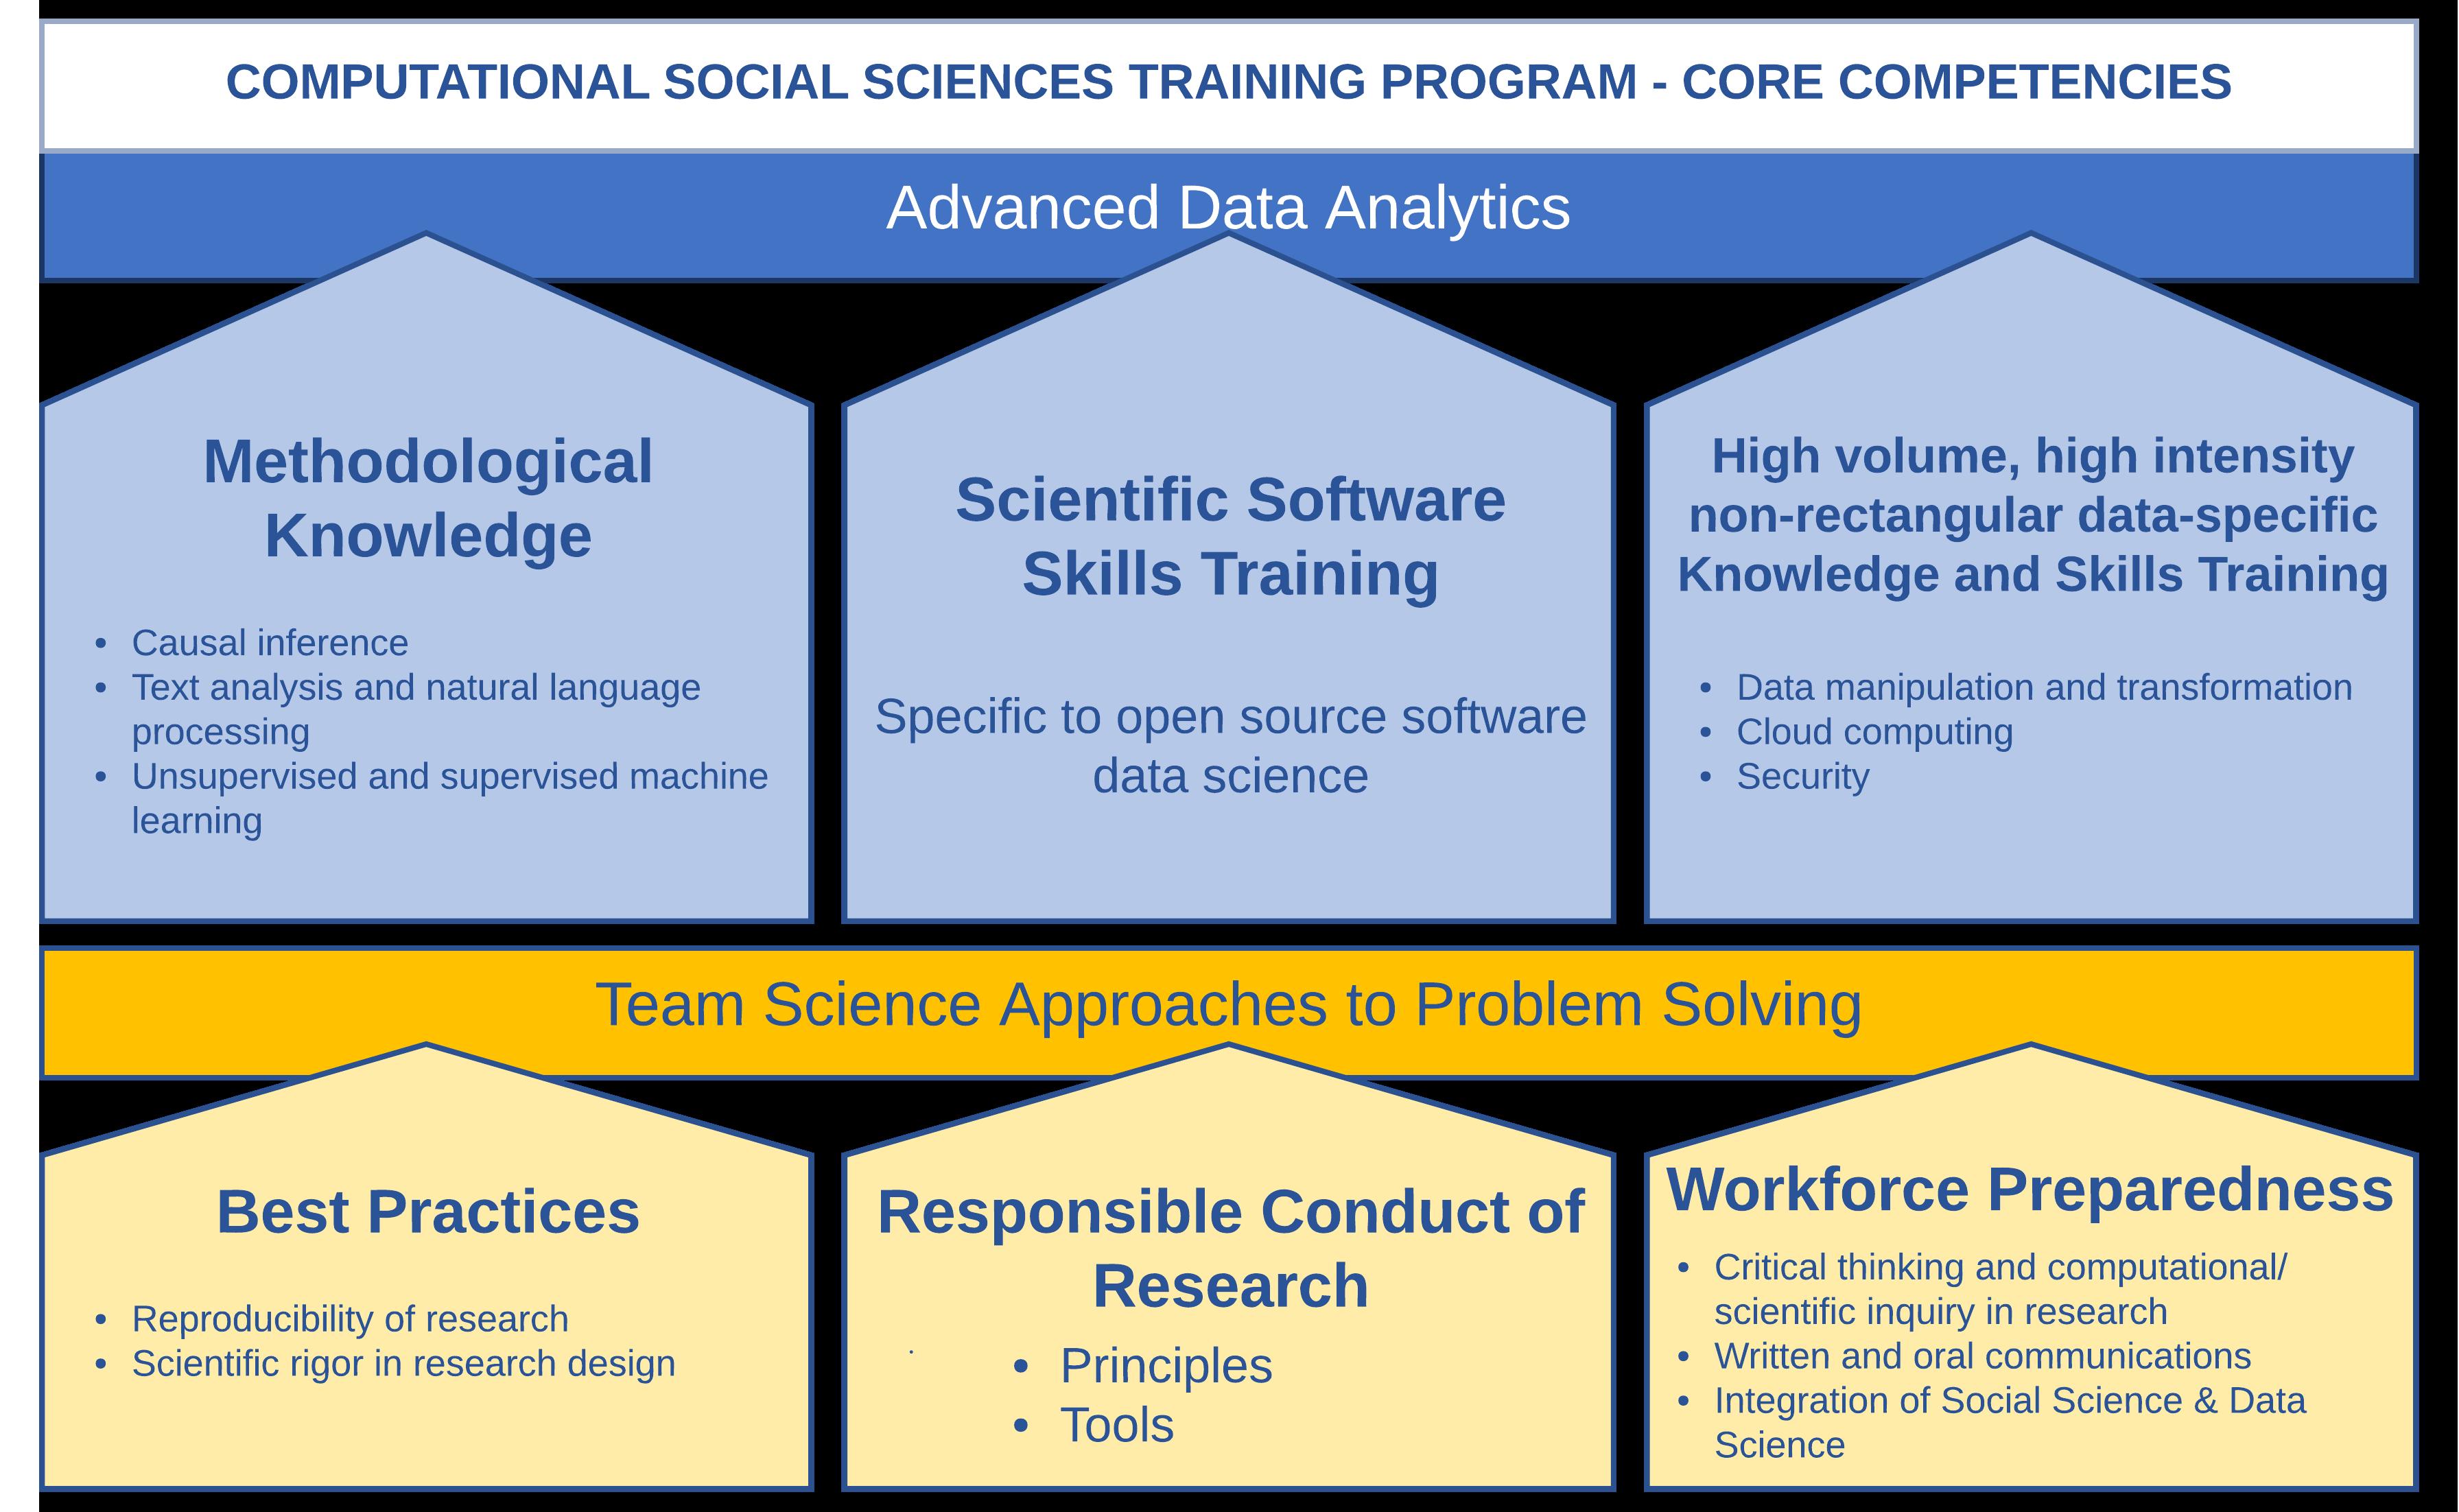 CSSTP Core Competencies